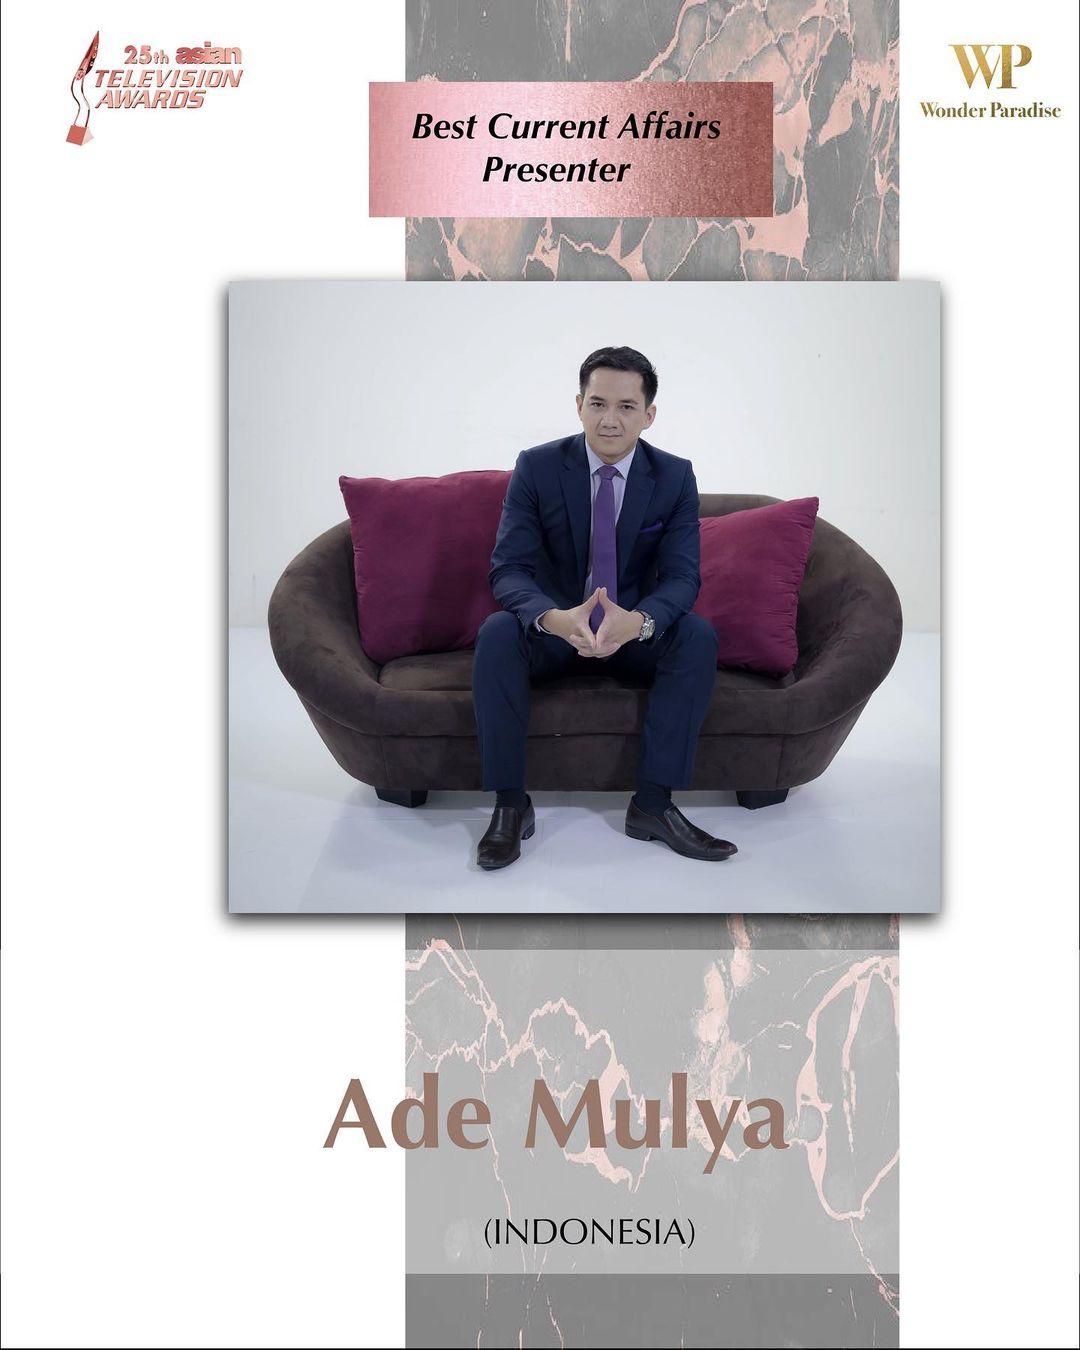 Presenter Metro Tv, Ade Mulya Menang di Asian Television Awards 2021